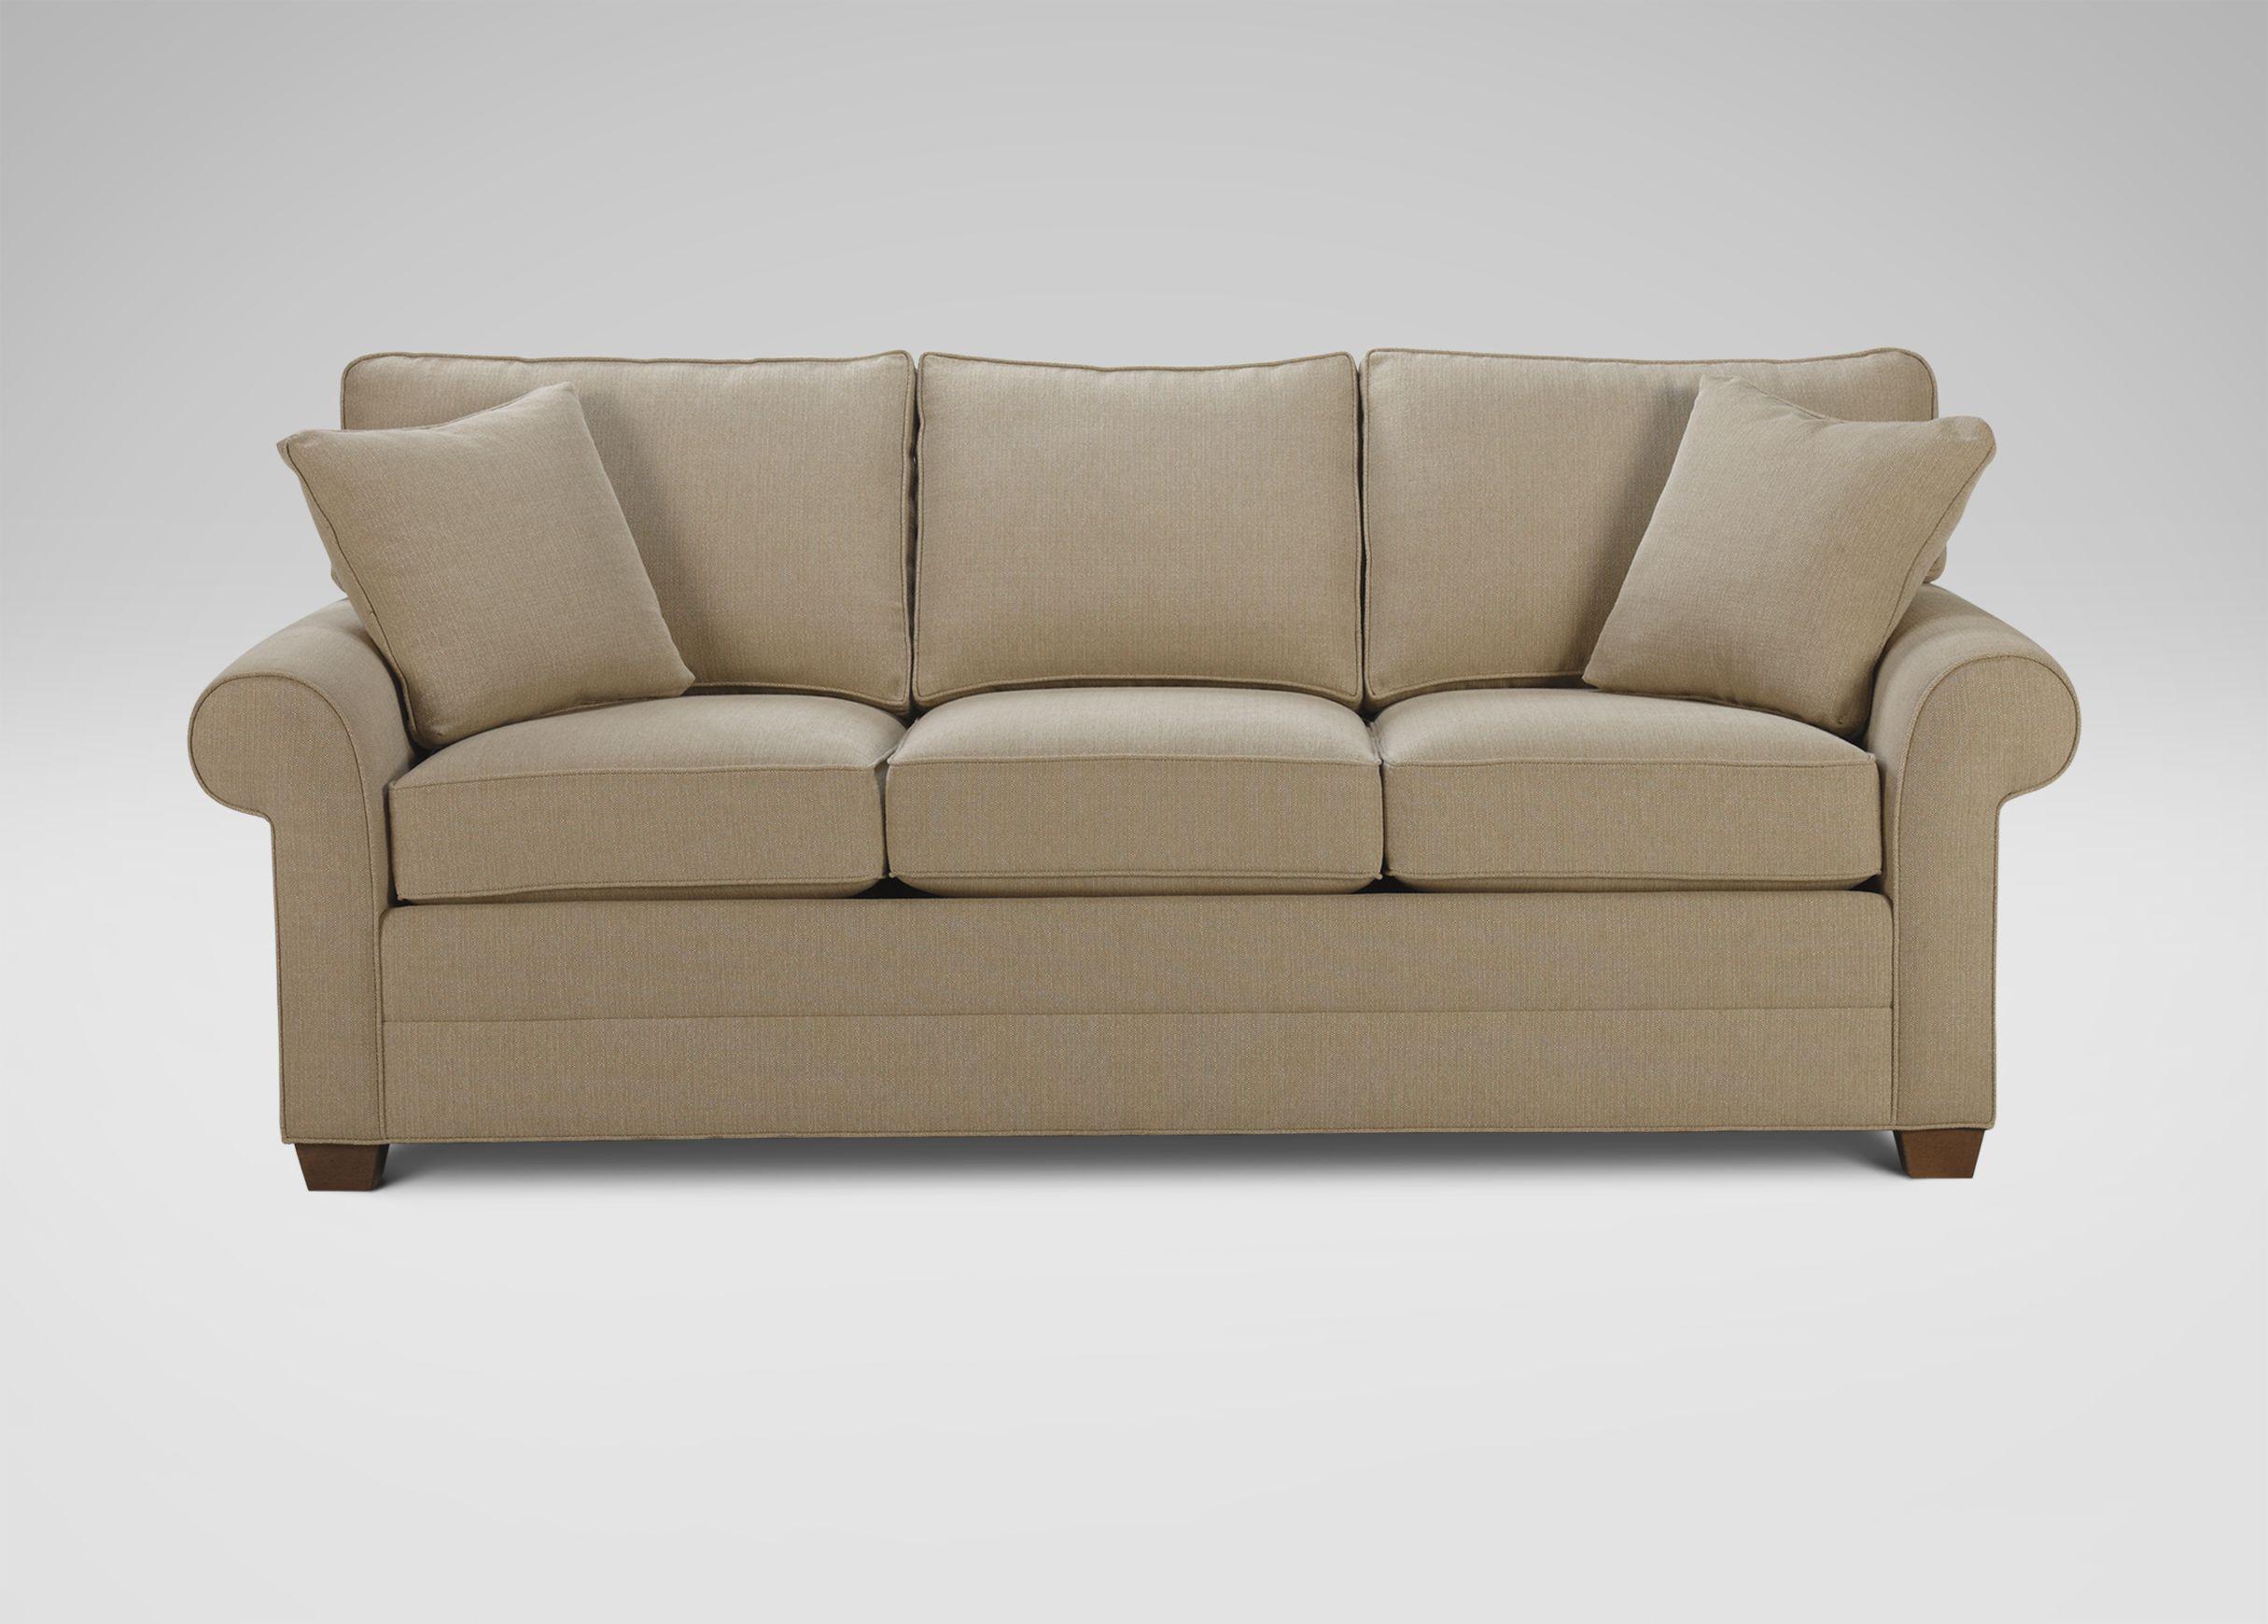 bennett leather sofa mart sectional roll arm cayman grain manayunk pinterest